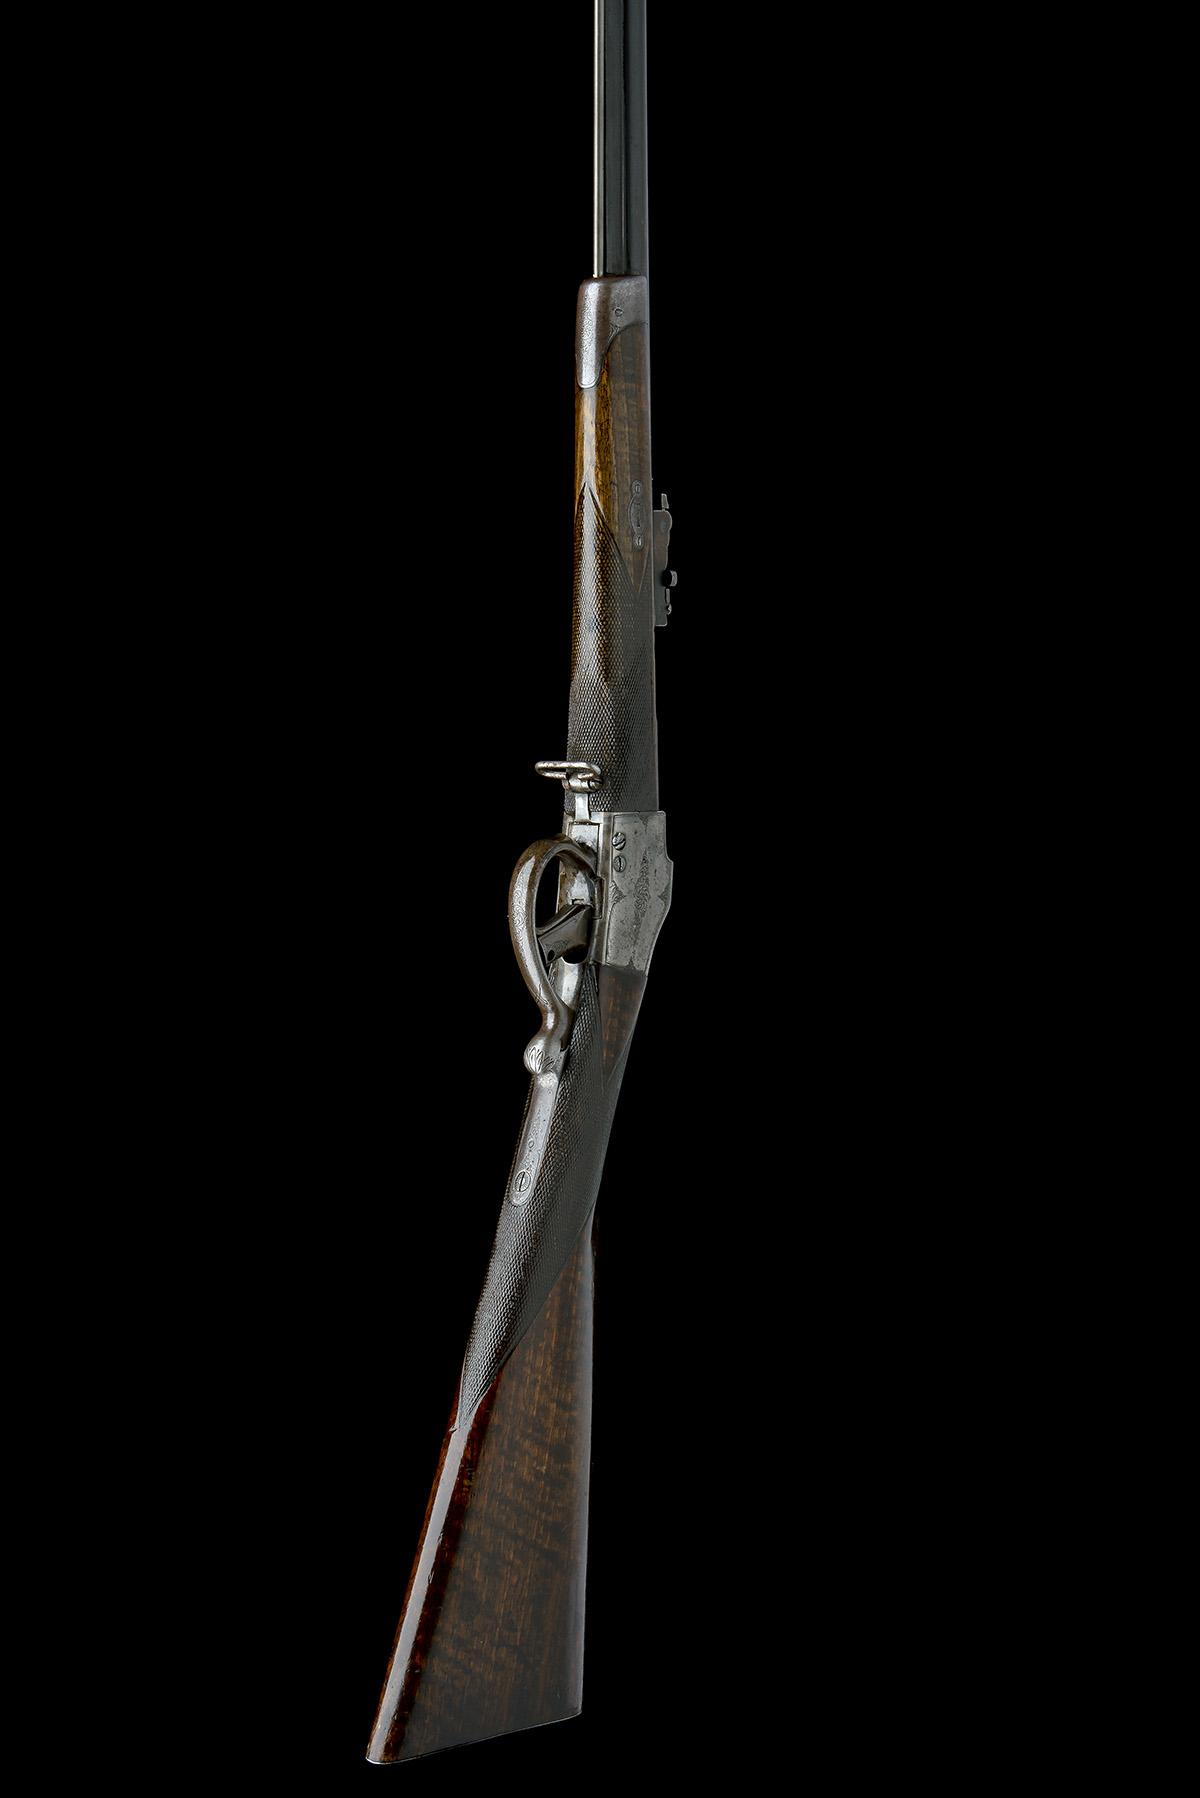 CHILEAN COMBLAIN AN 11x50R SINGLE-SHOT FALLING-BLOCK SPORTING-RIFLE, UNSIGNED, MODEL 'M84 COMBLAIN - Image 8 of 9